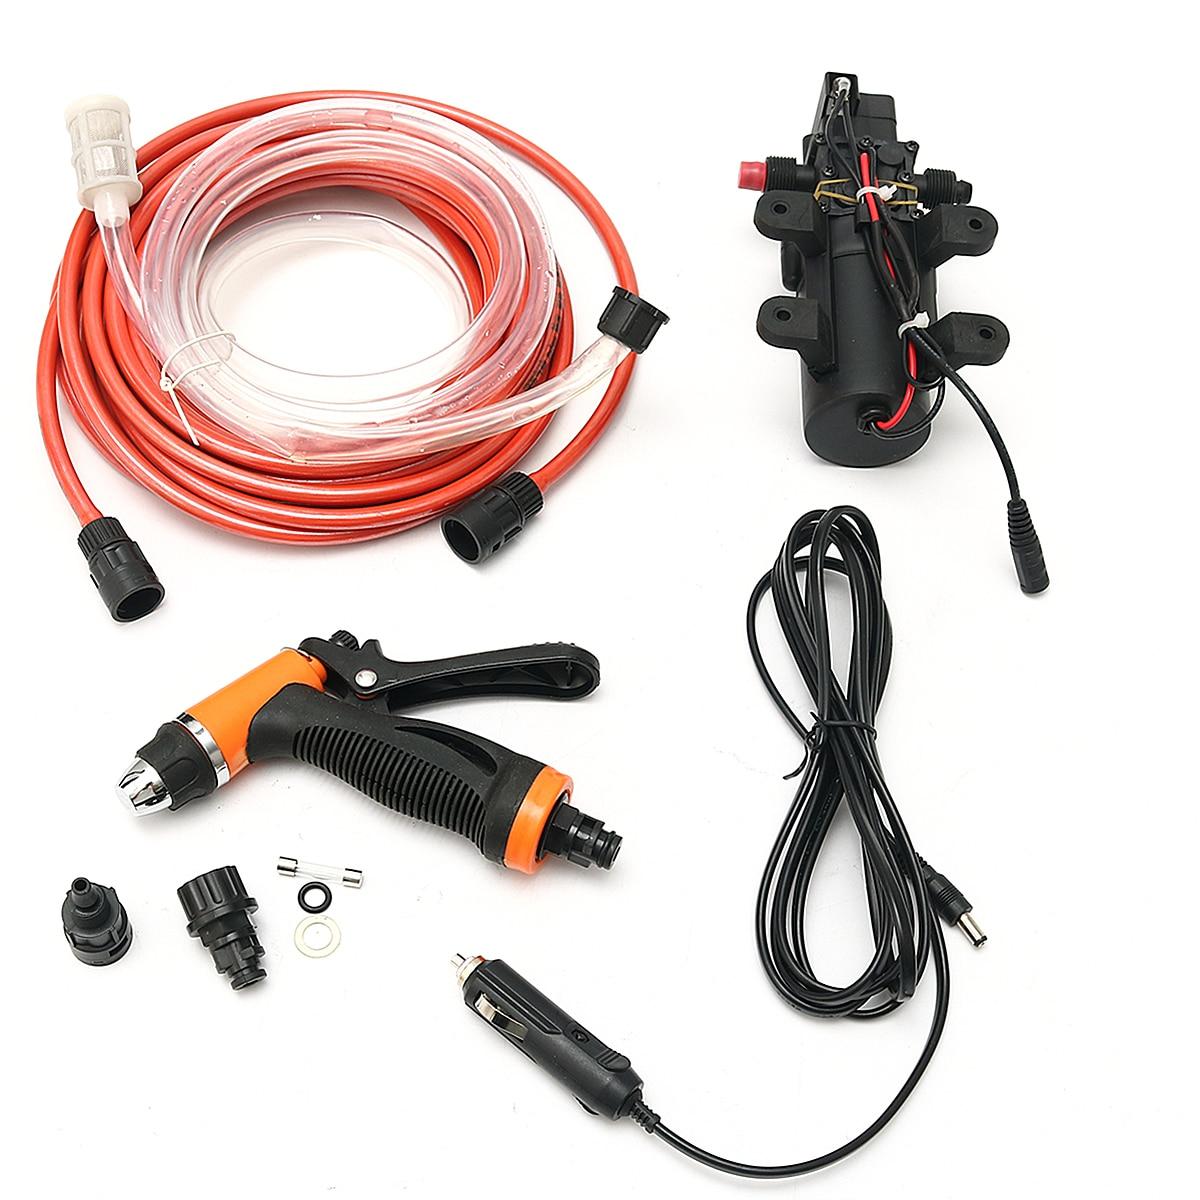 12V 100W 160PSI High Pressure Self priming Electric Car Wash Pump Portable Washing Machine Cigarette Lighter